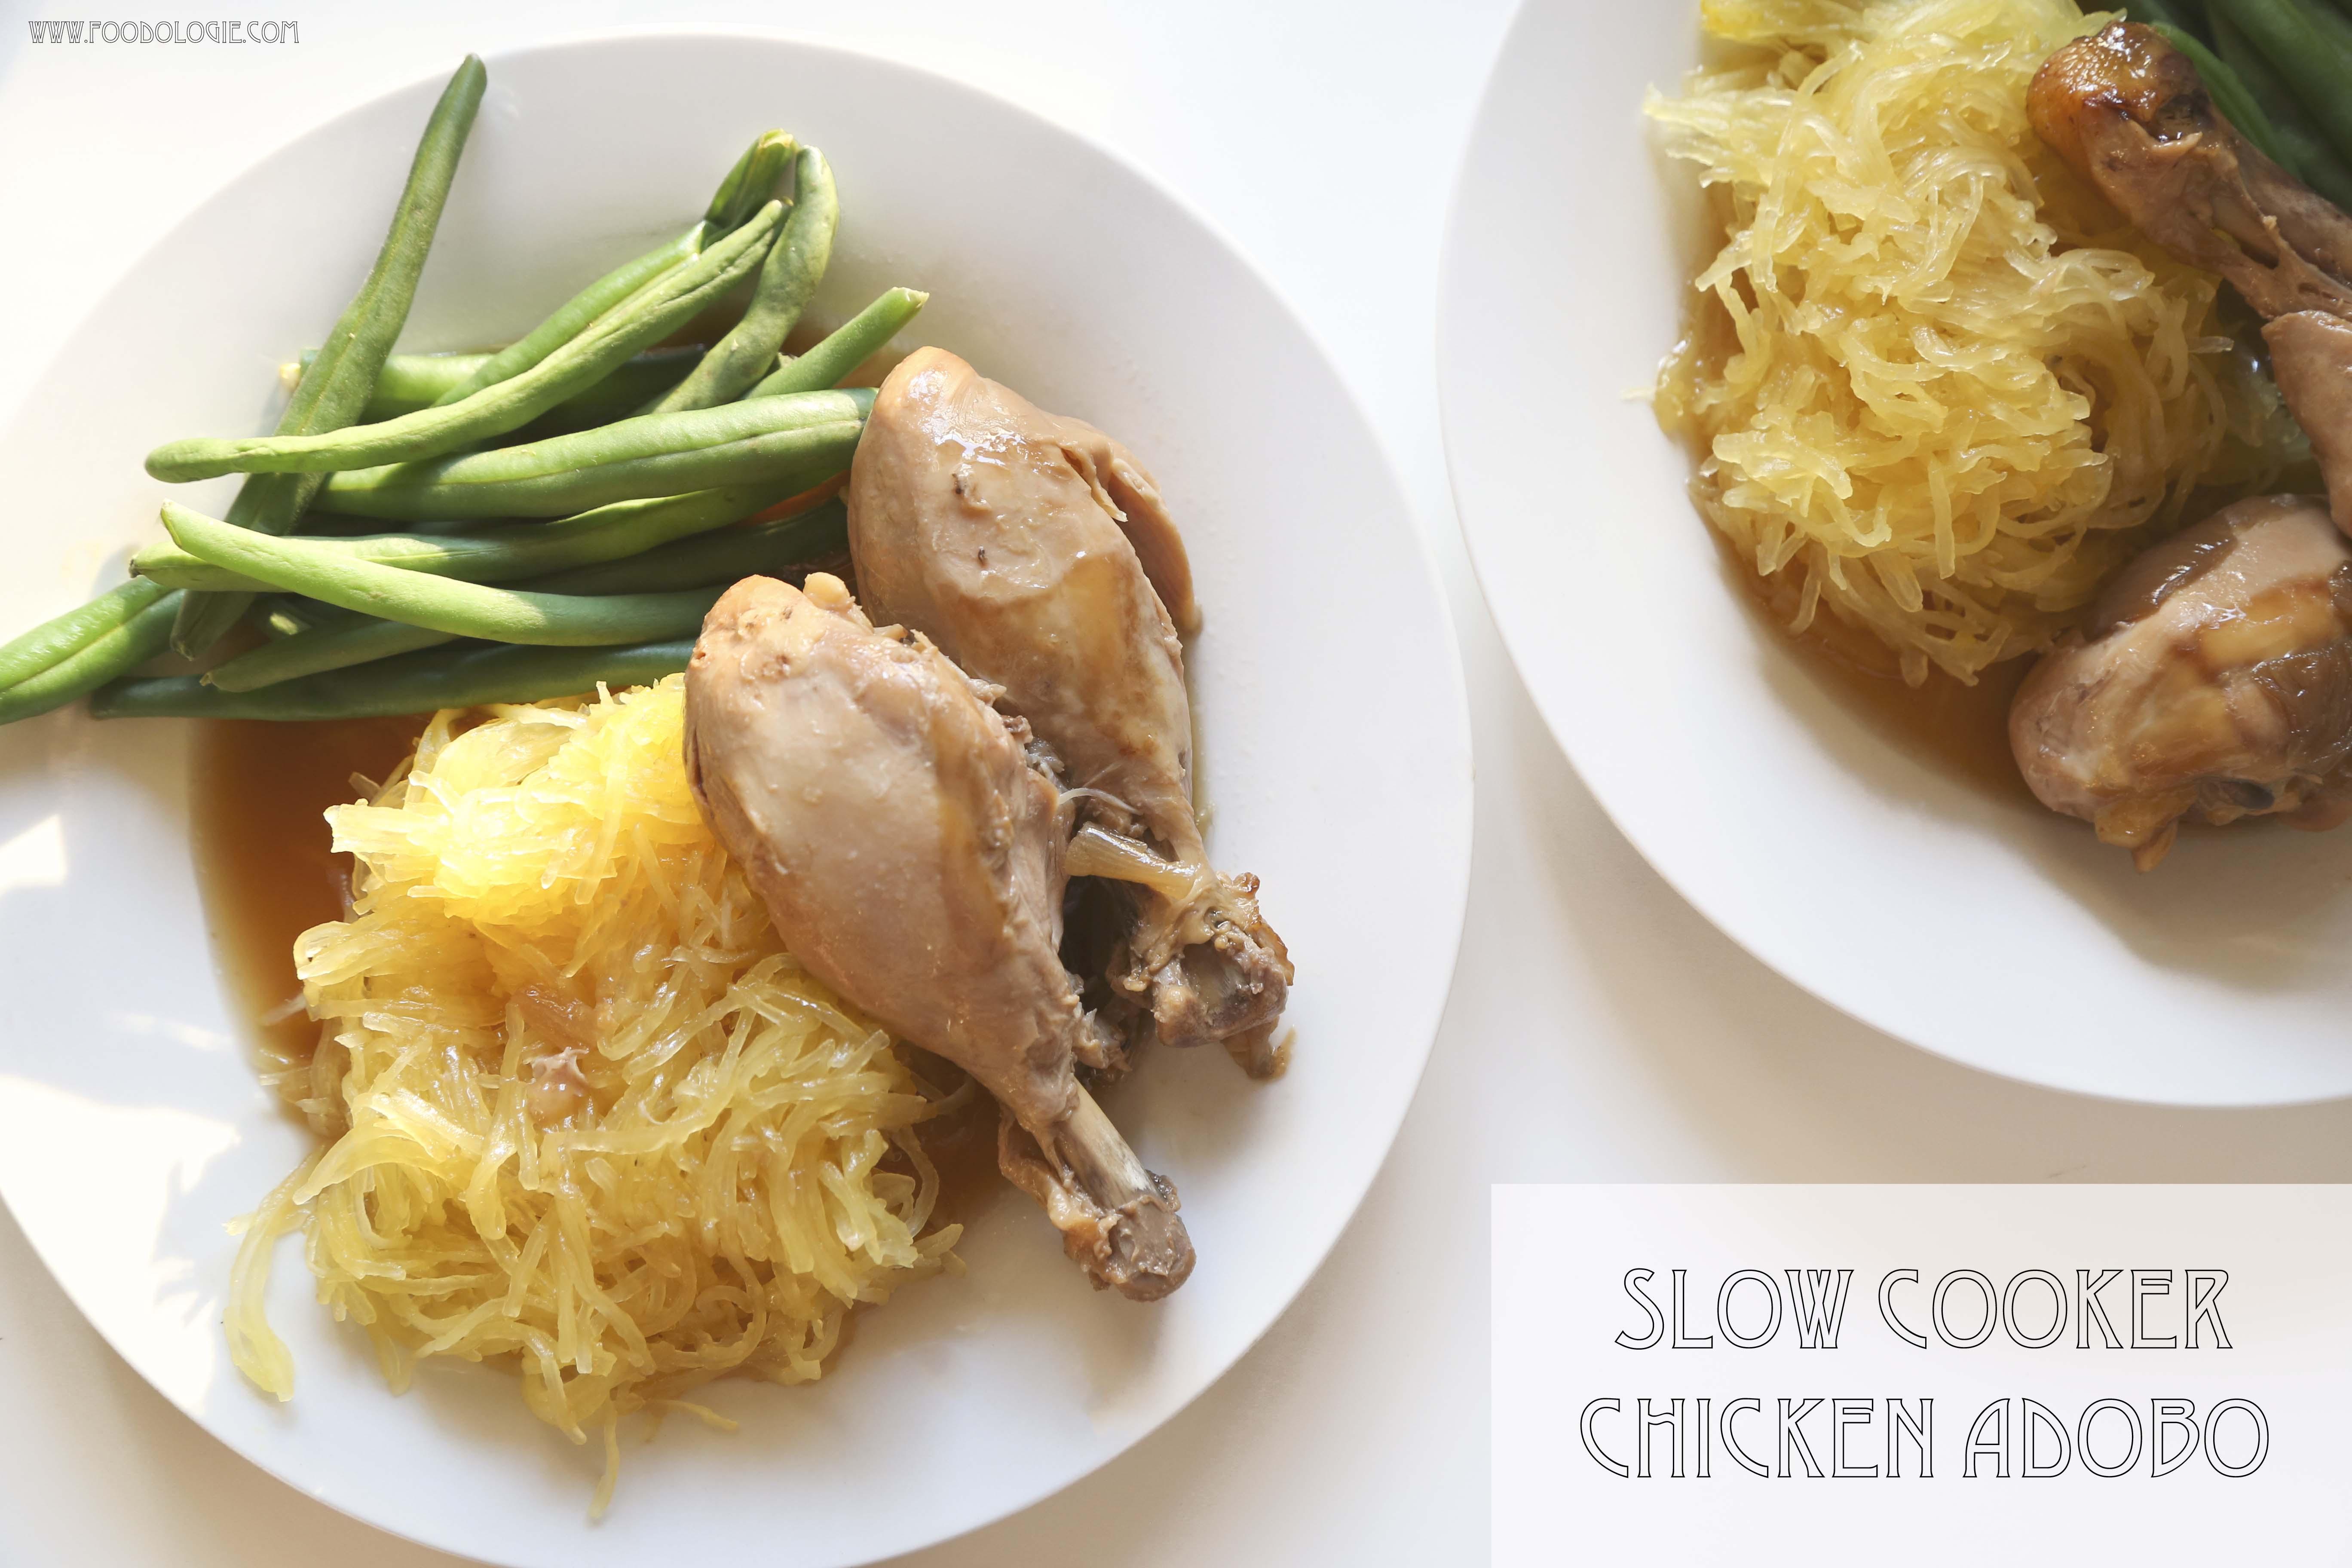 ... slow cooker chicken and dumplings slow cooker chicken adobo recipe